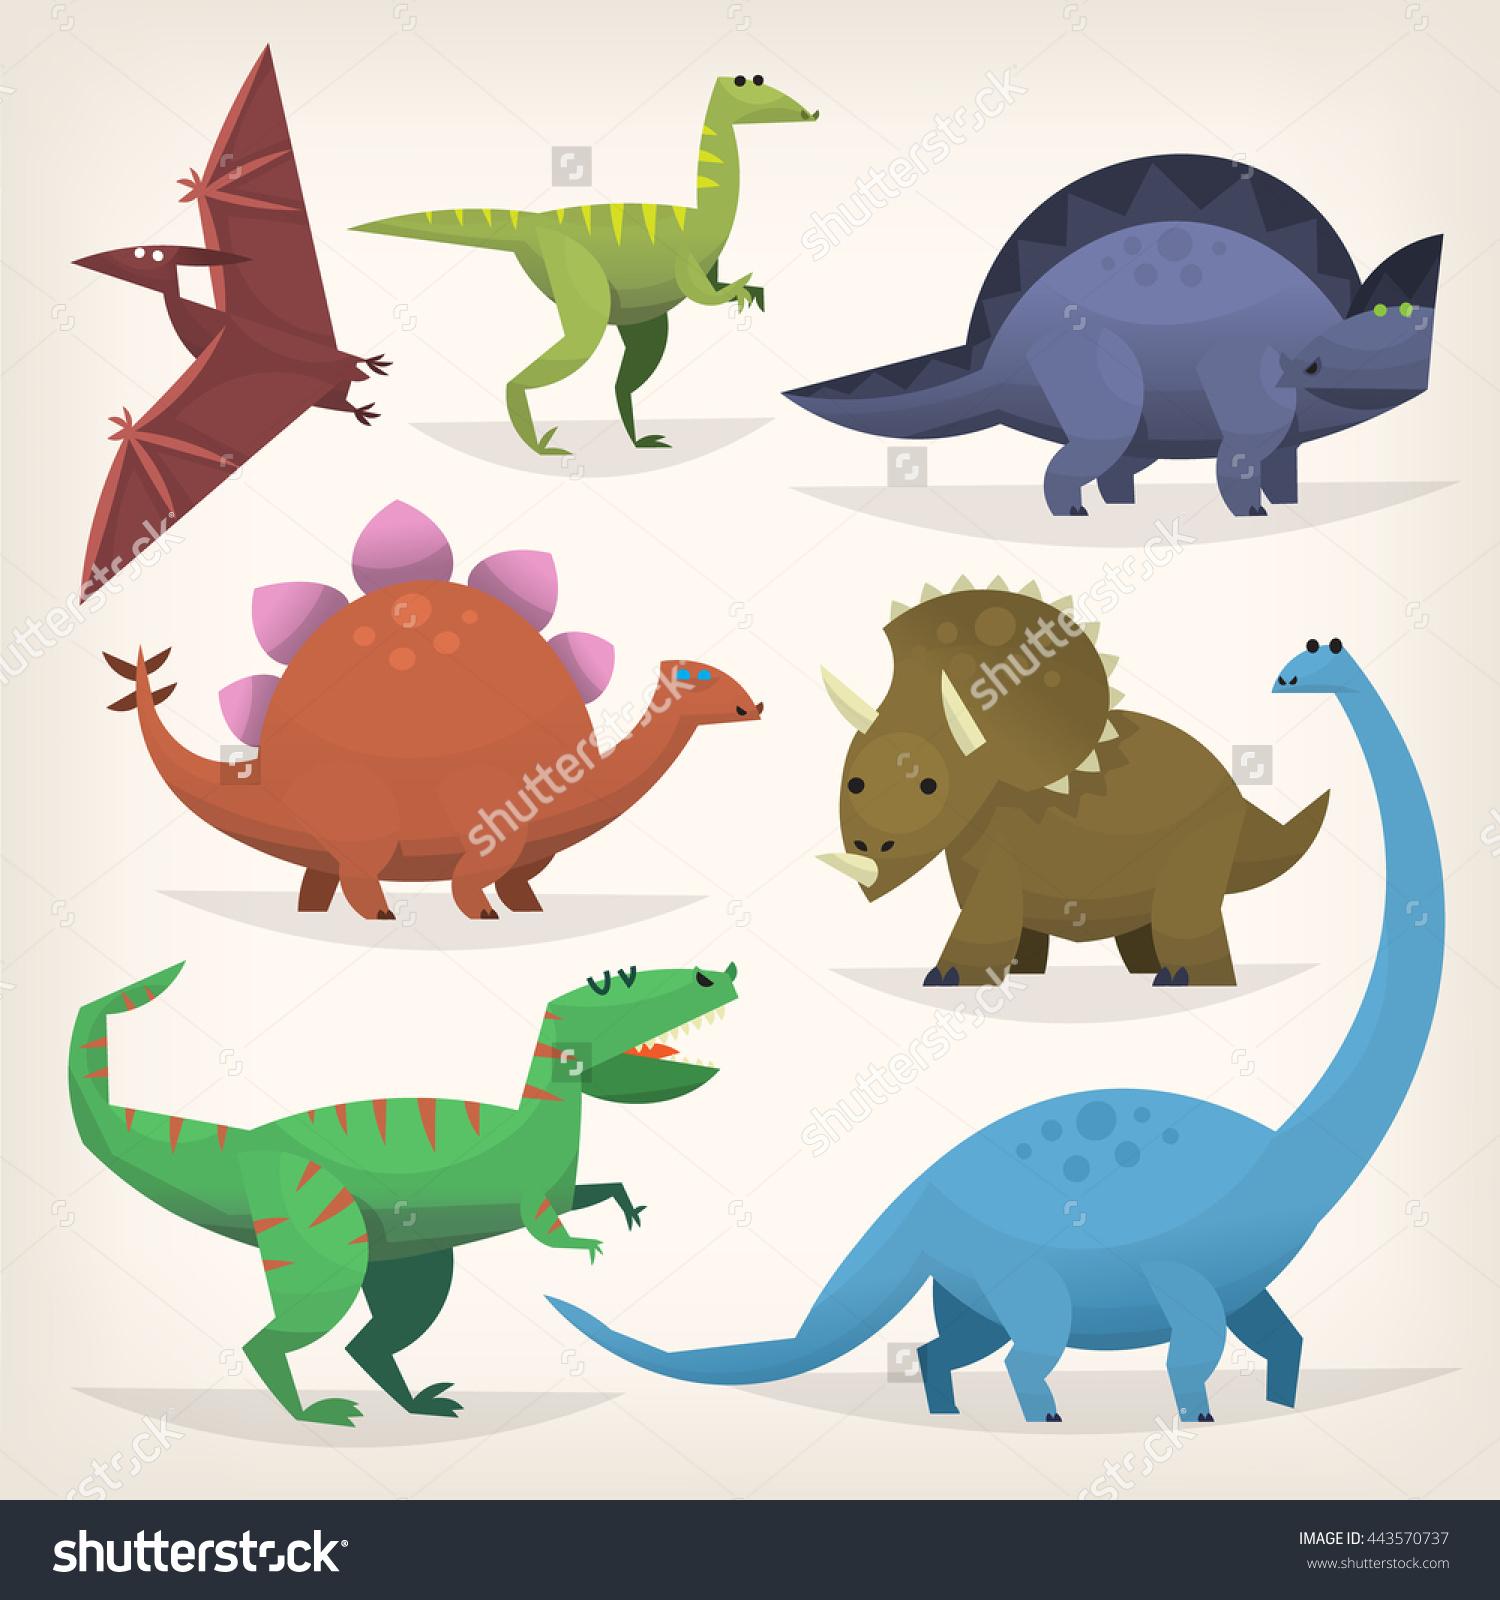 Cute Cartoon Dinosaurs Prehistoric Jurassic Period Stock Vector.